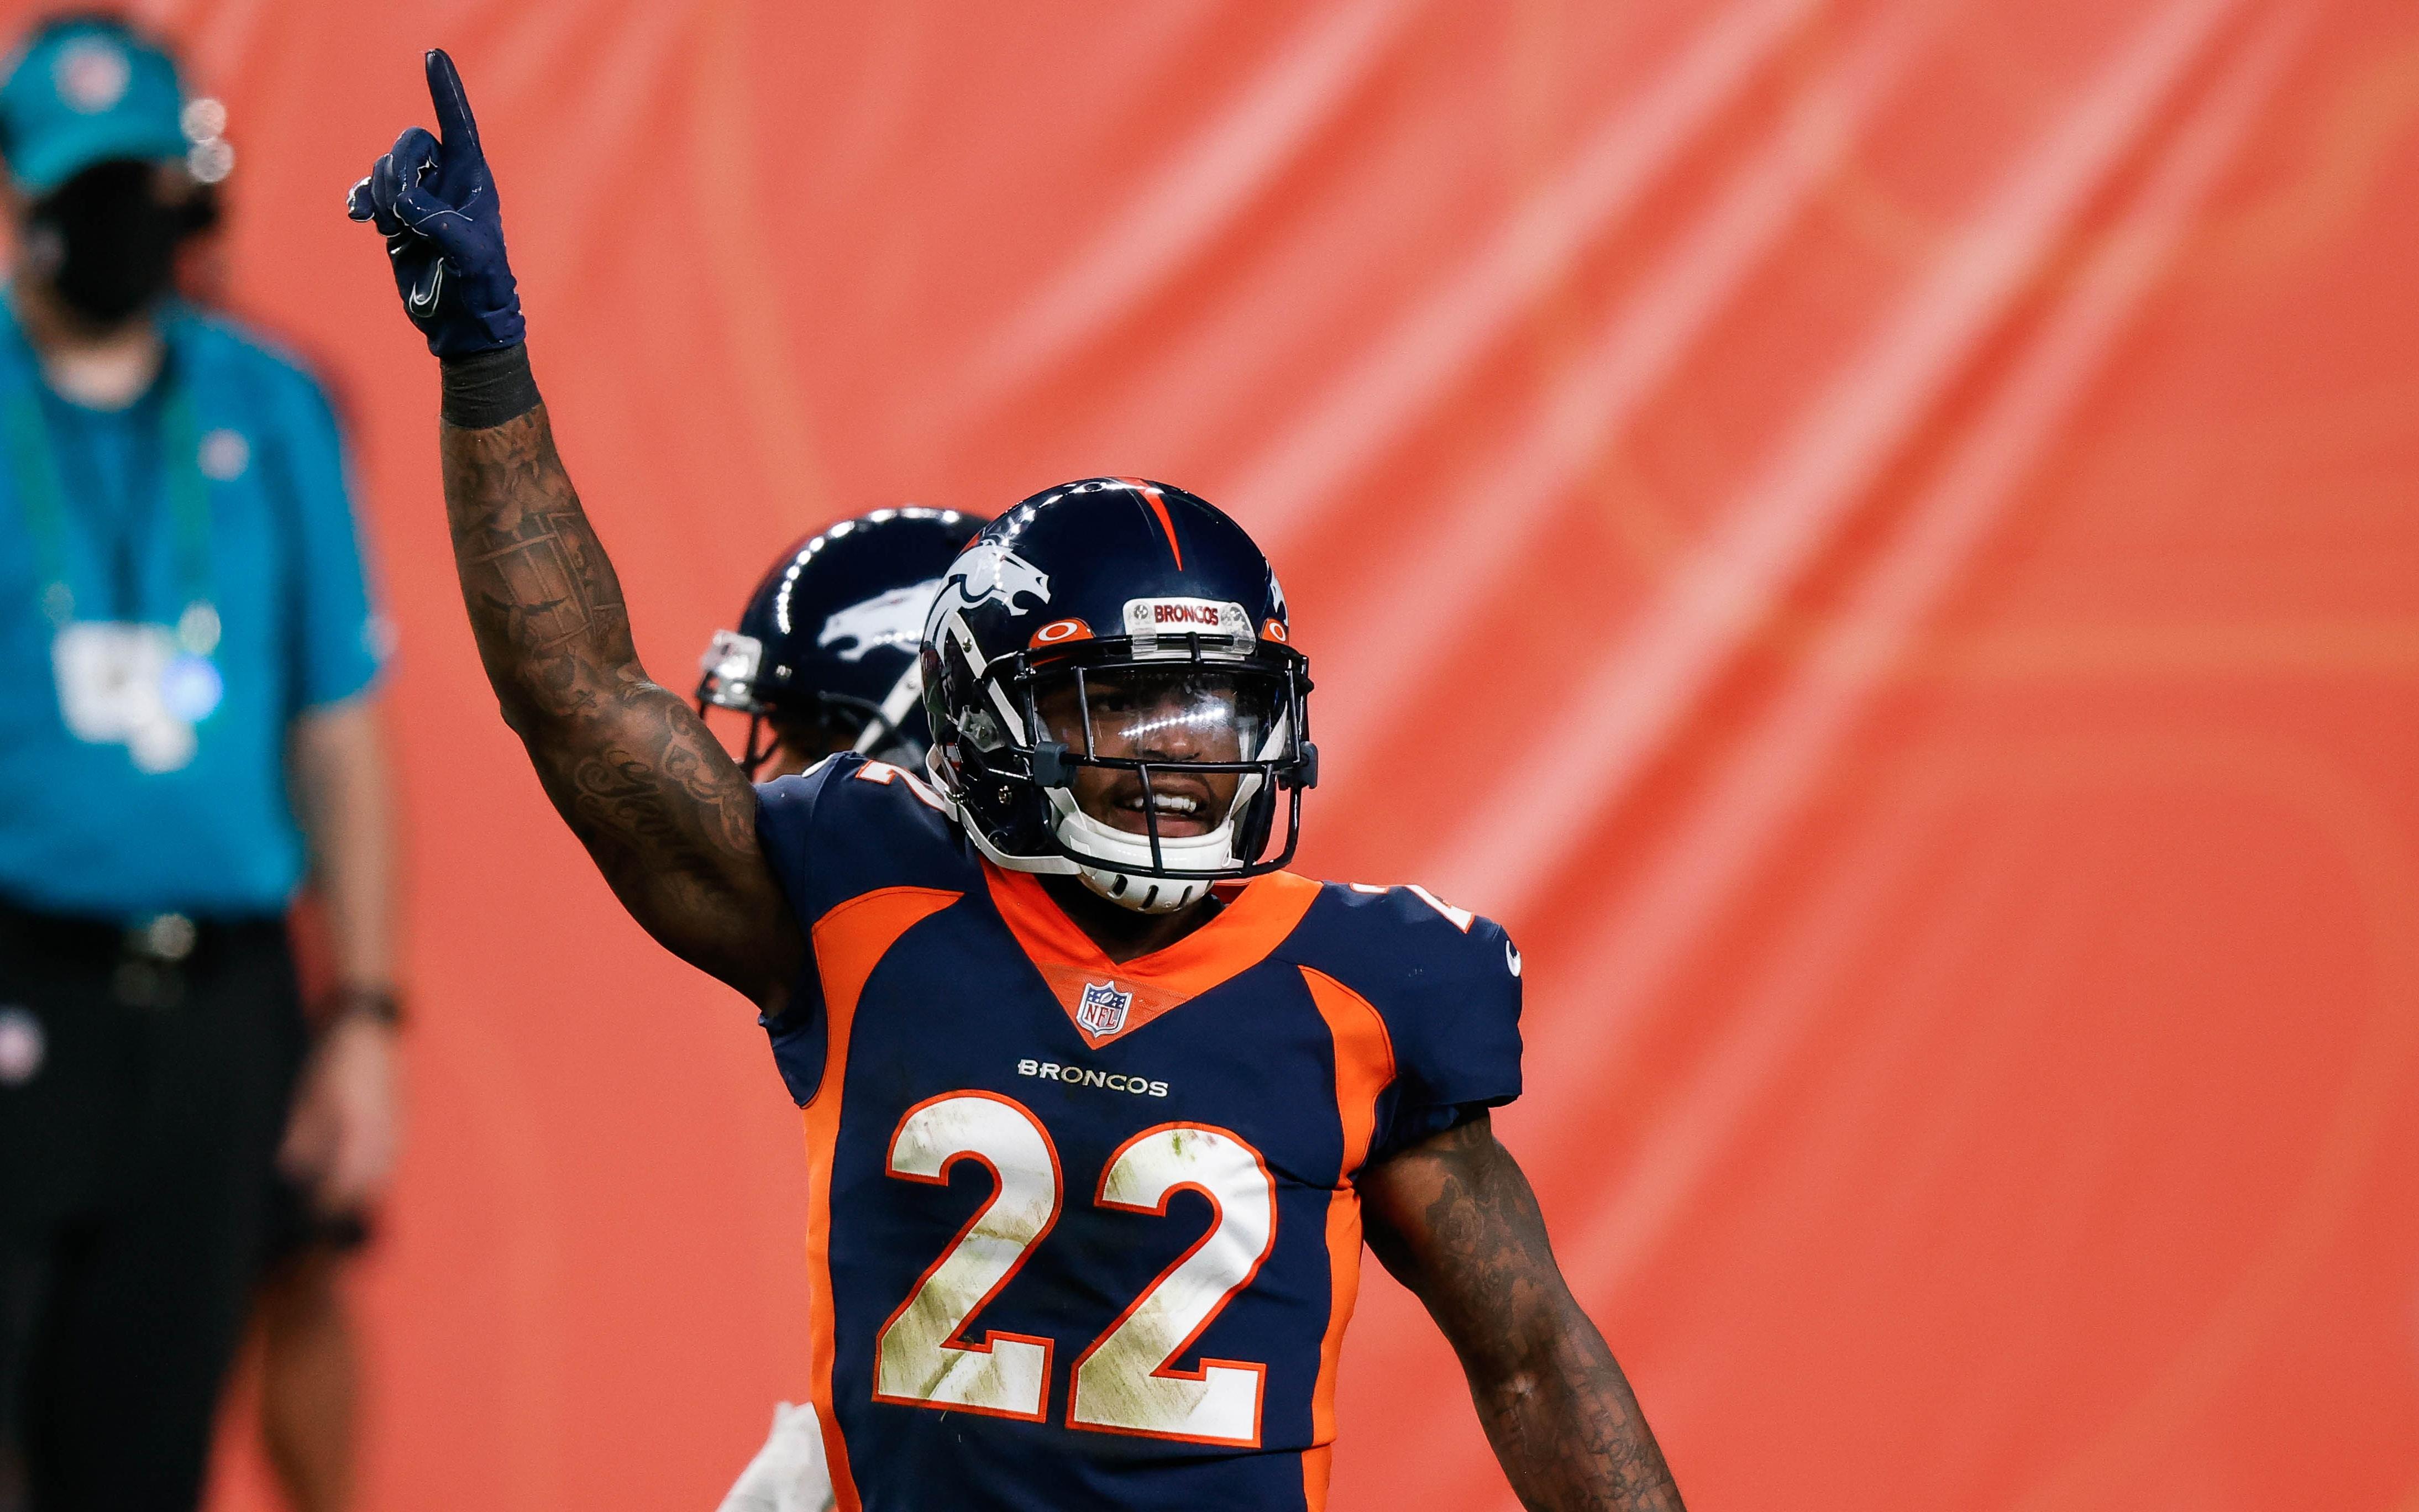 Kareem Jackson in 2020. Credit: Isiah J. Downing, USA TODAY Sports.